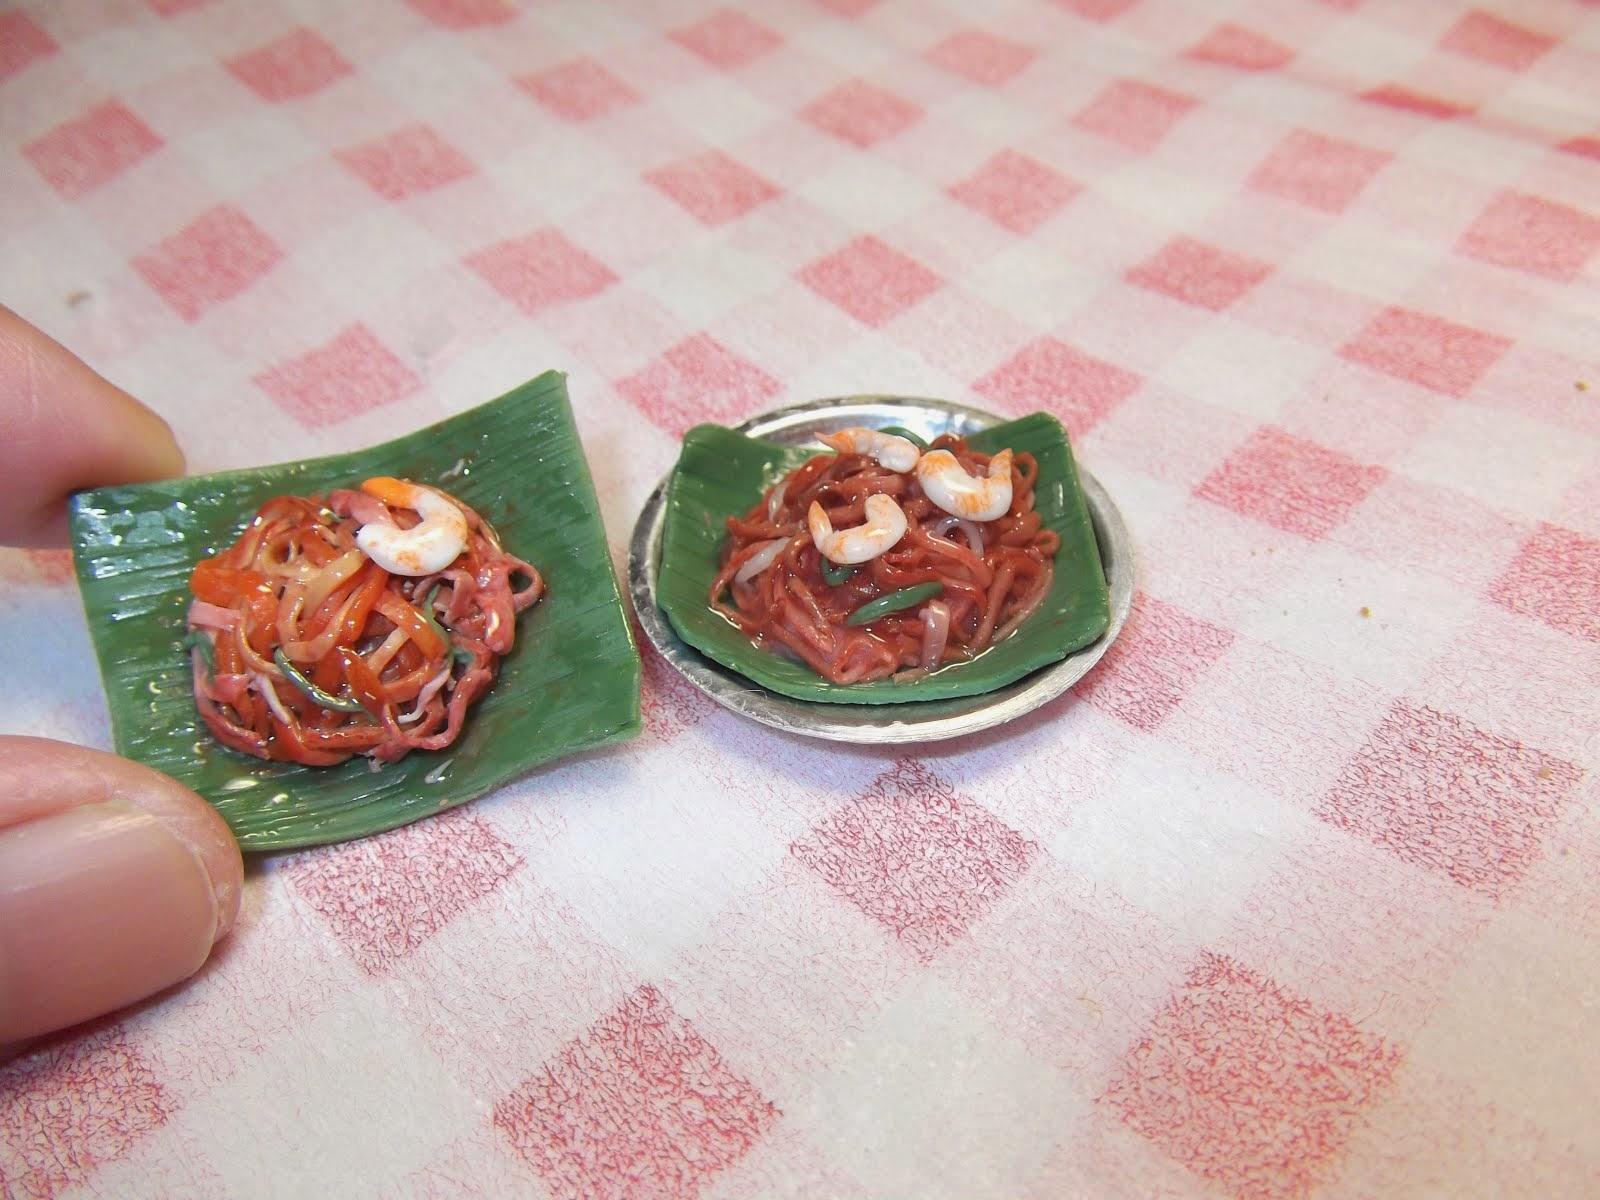 My handmade miniature kway teow